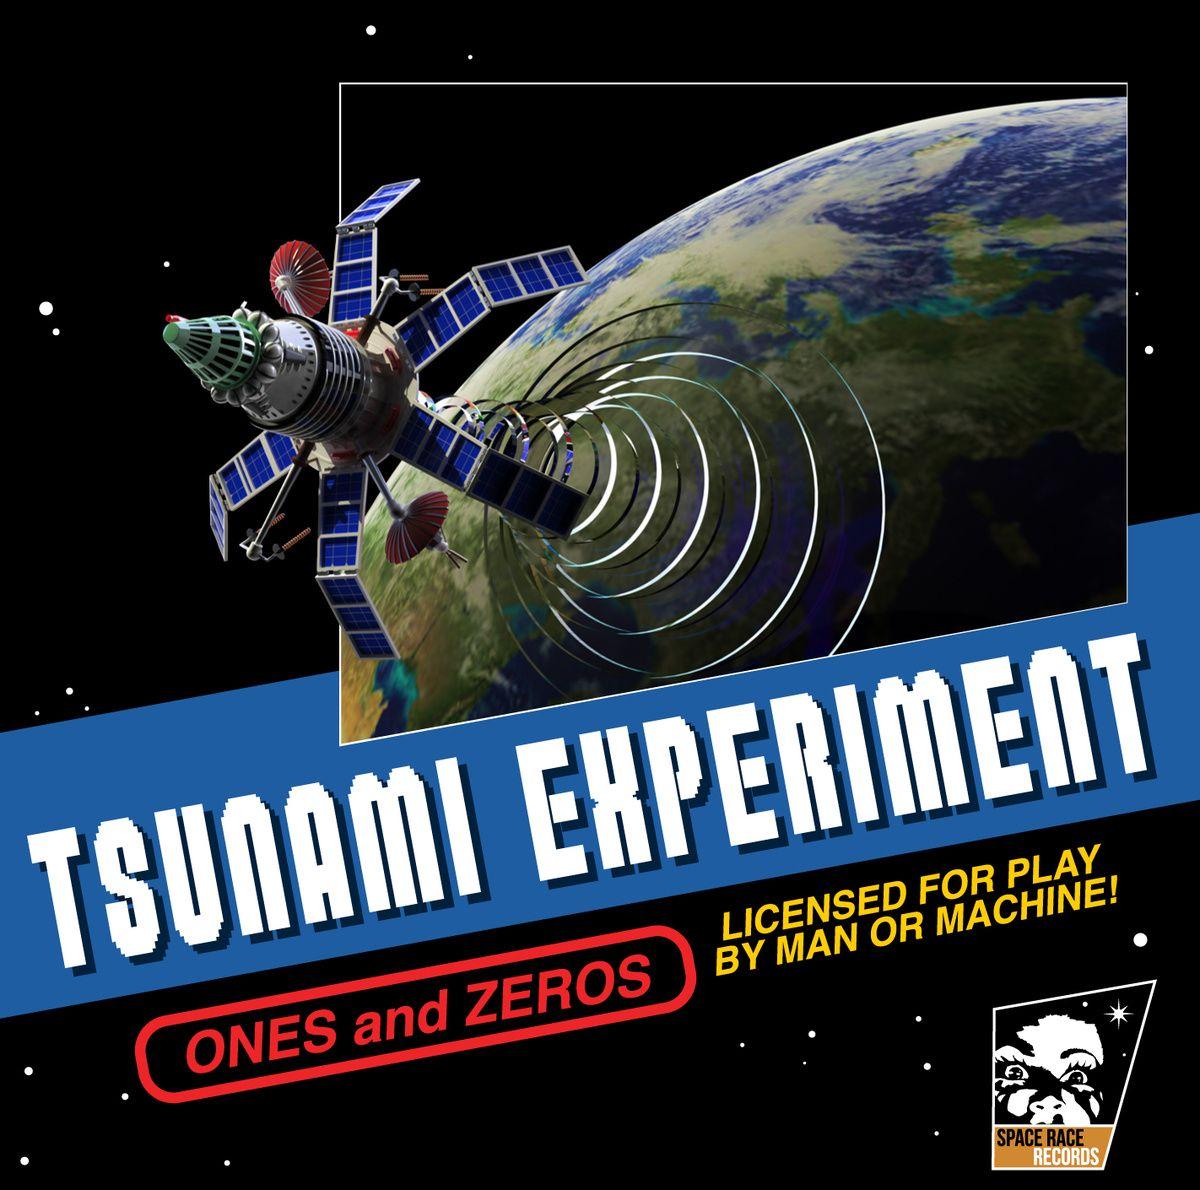 The Tsunami Experiment - Ones and Zeros